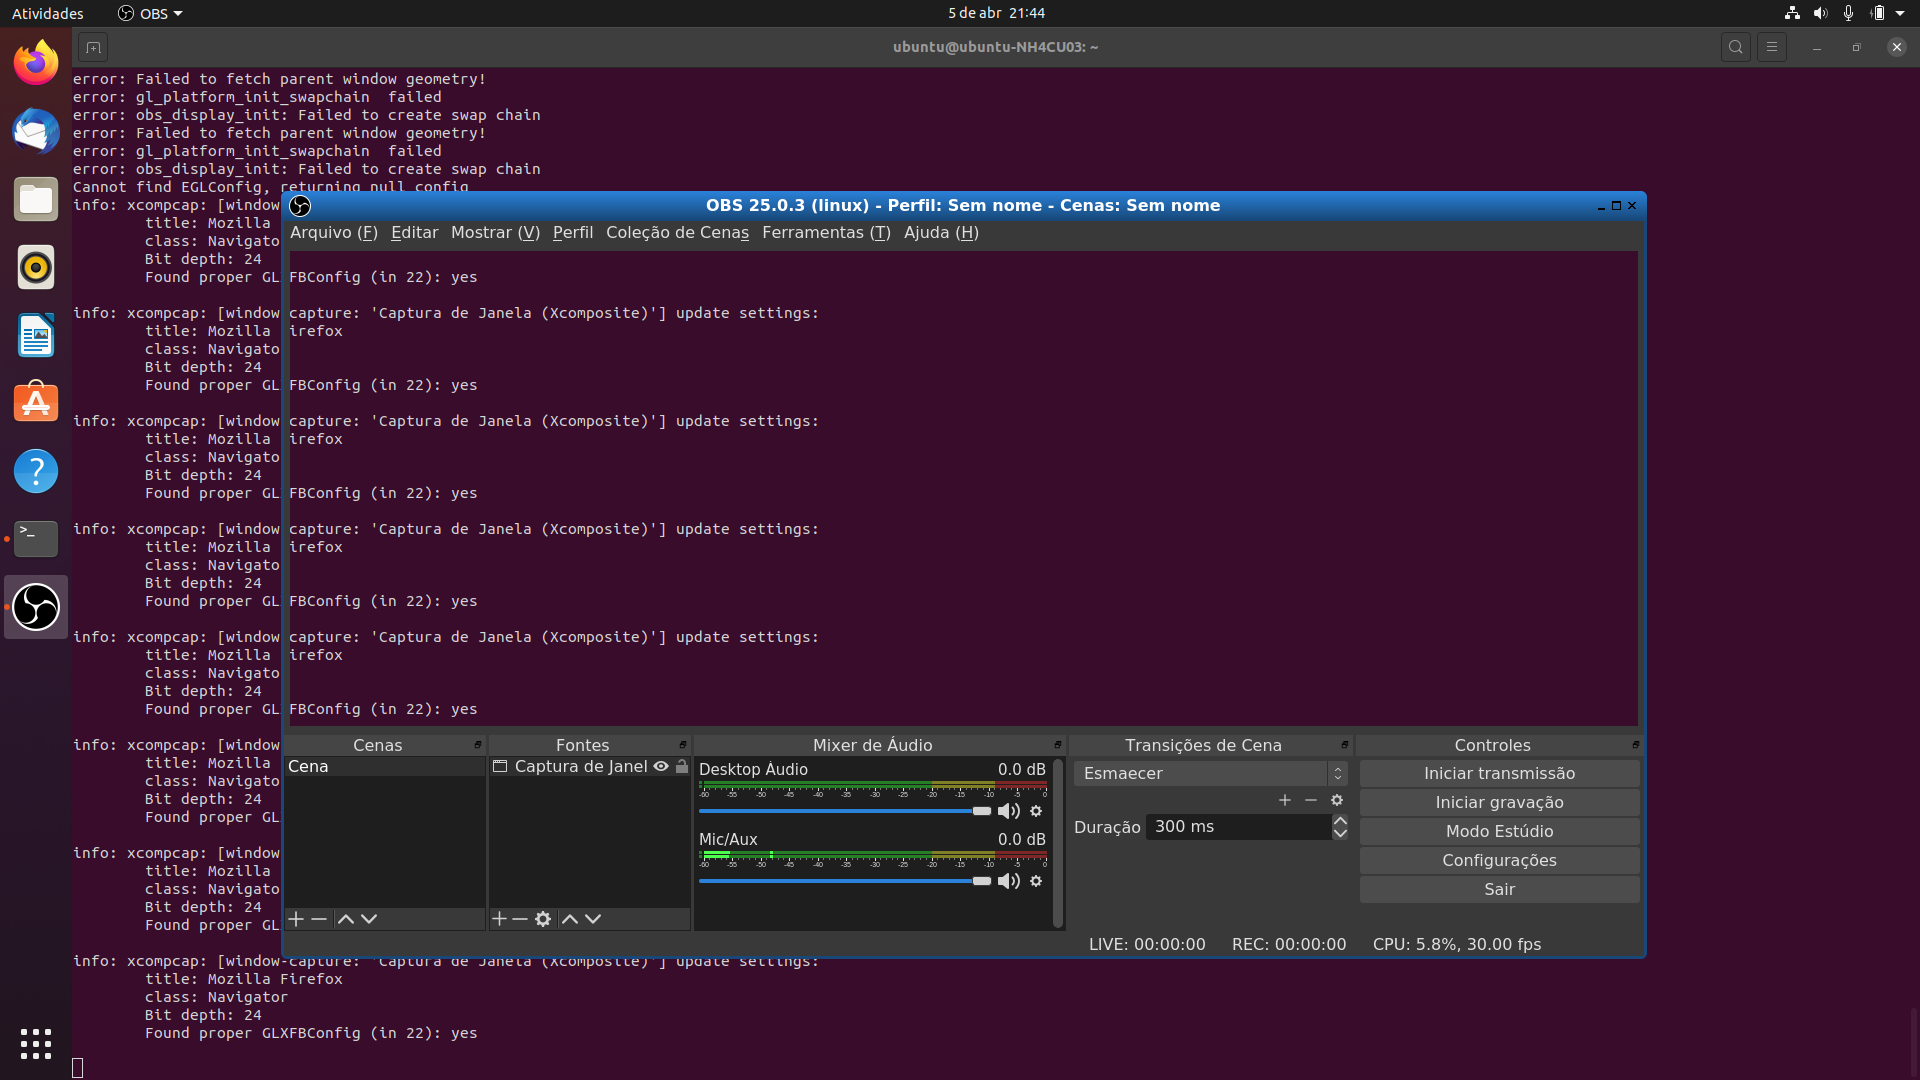 Captura de tela de 2020-04-05 21-44-36